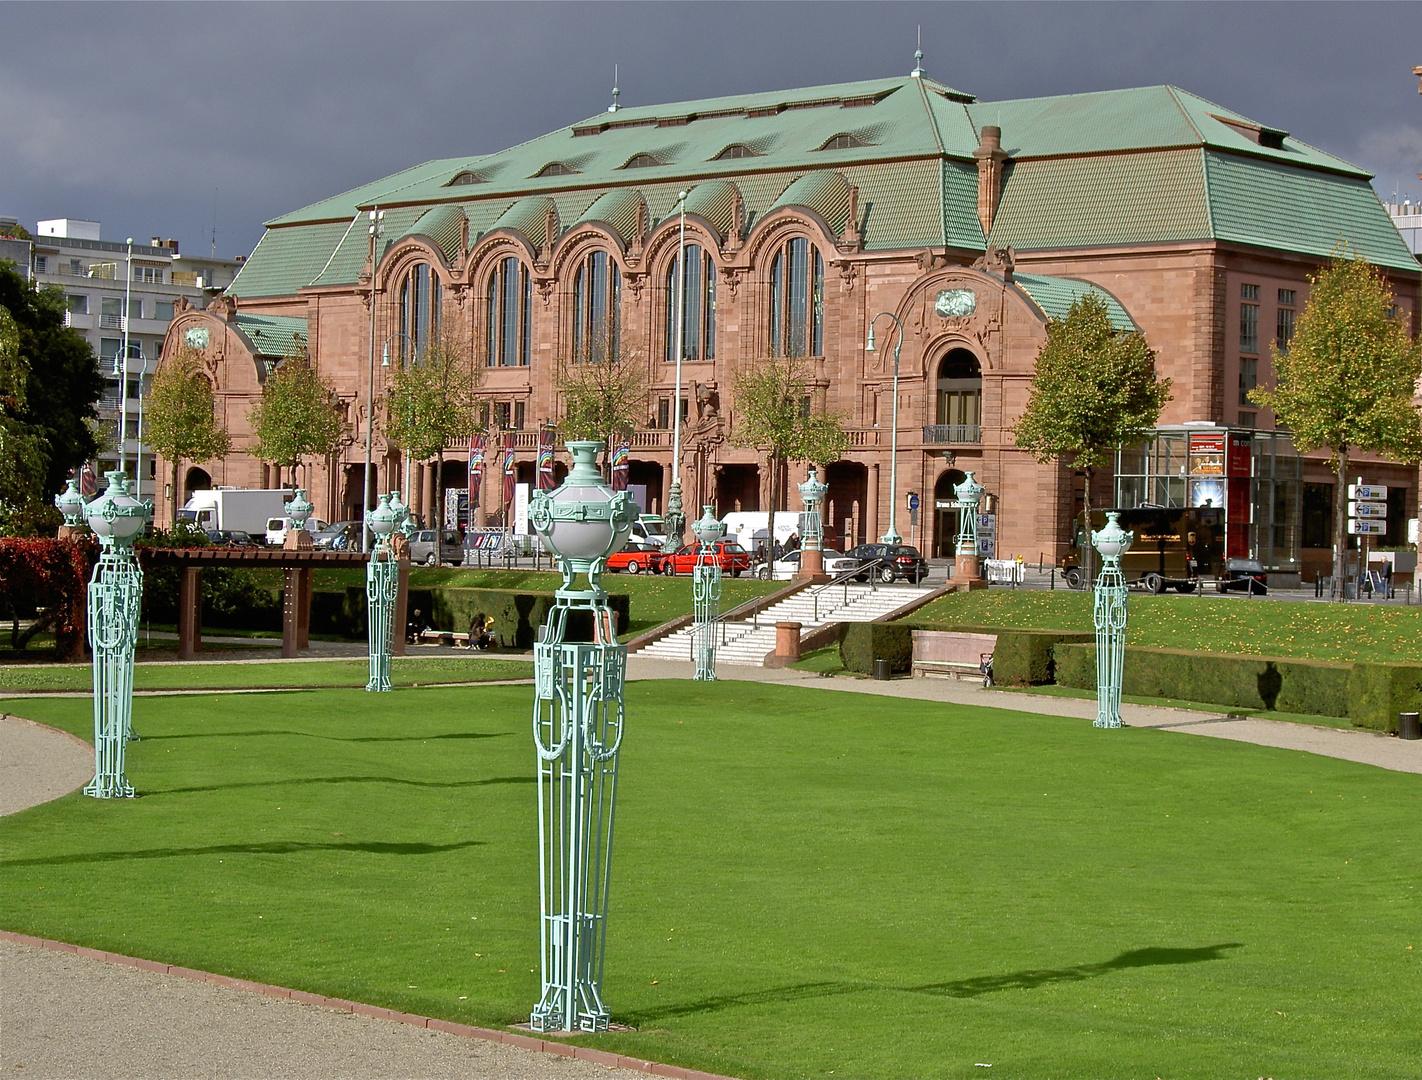 Rosengarten in Mannheim